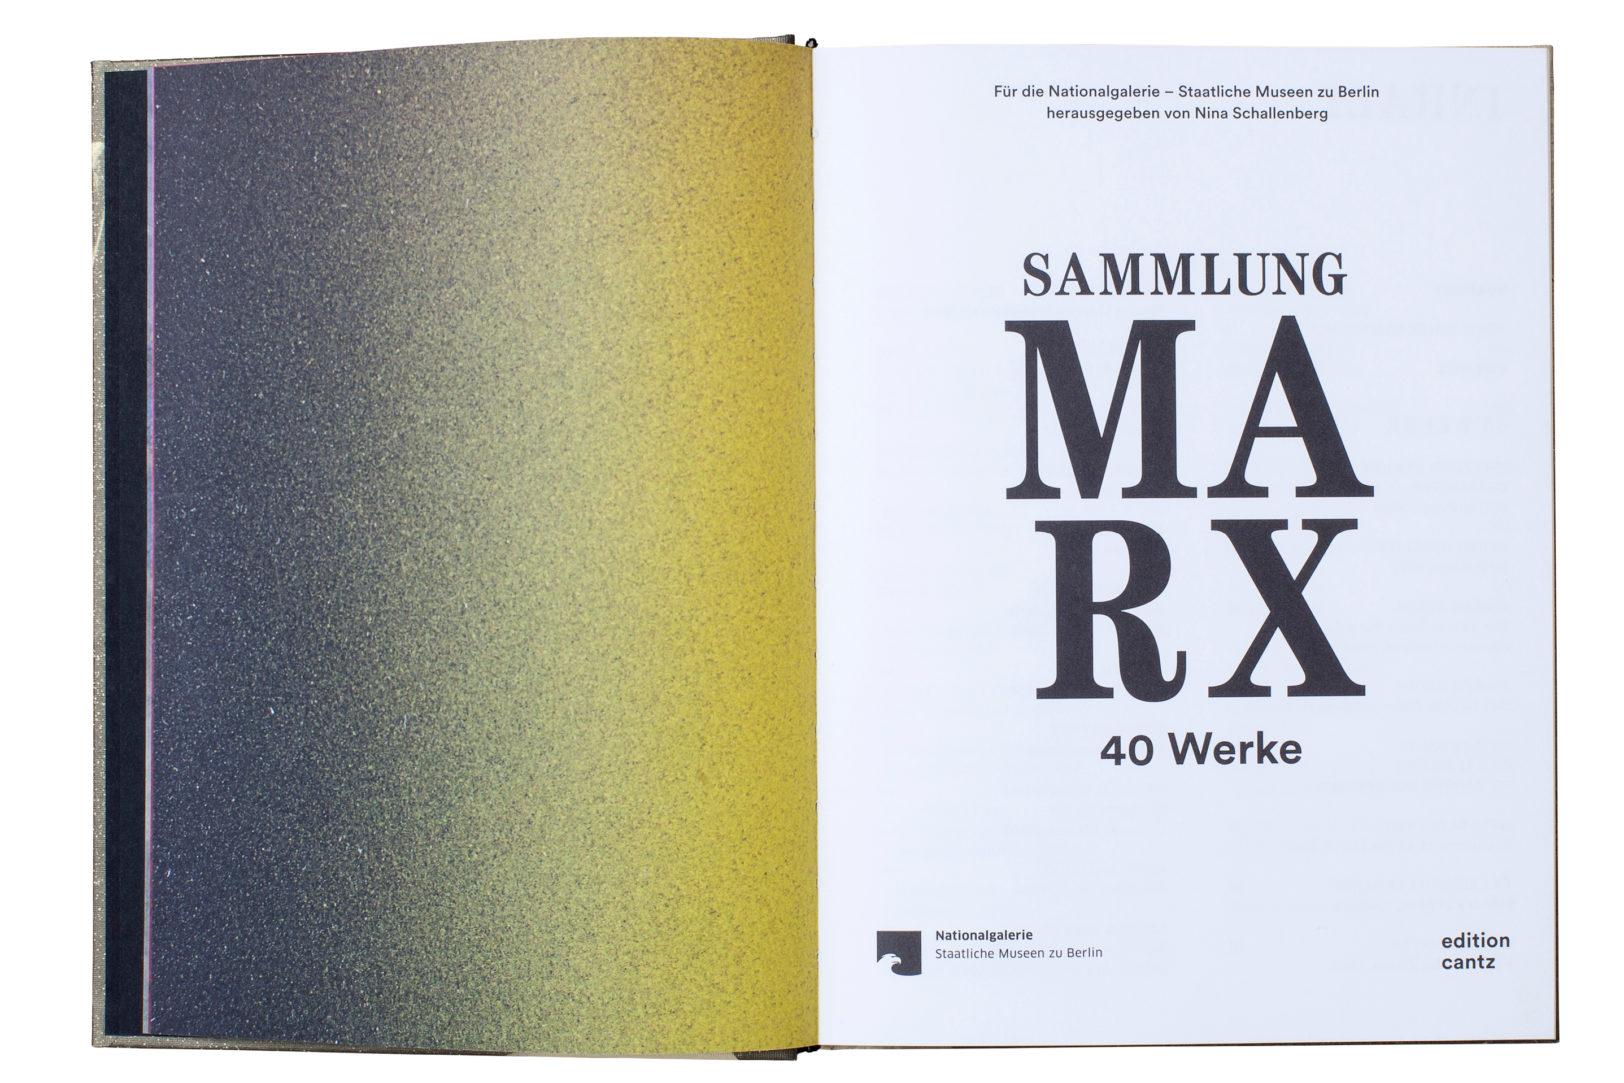 http://e-o-t.de/wordpress/wp-content/uploads/2020/06/Books-Marx-eot8.jpg